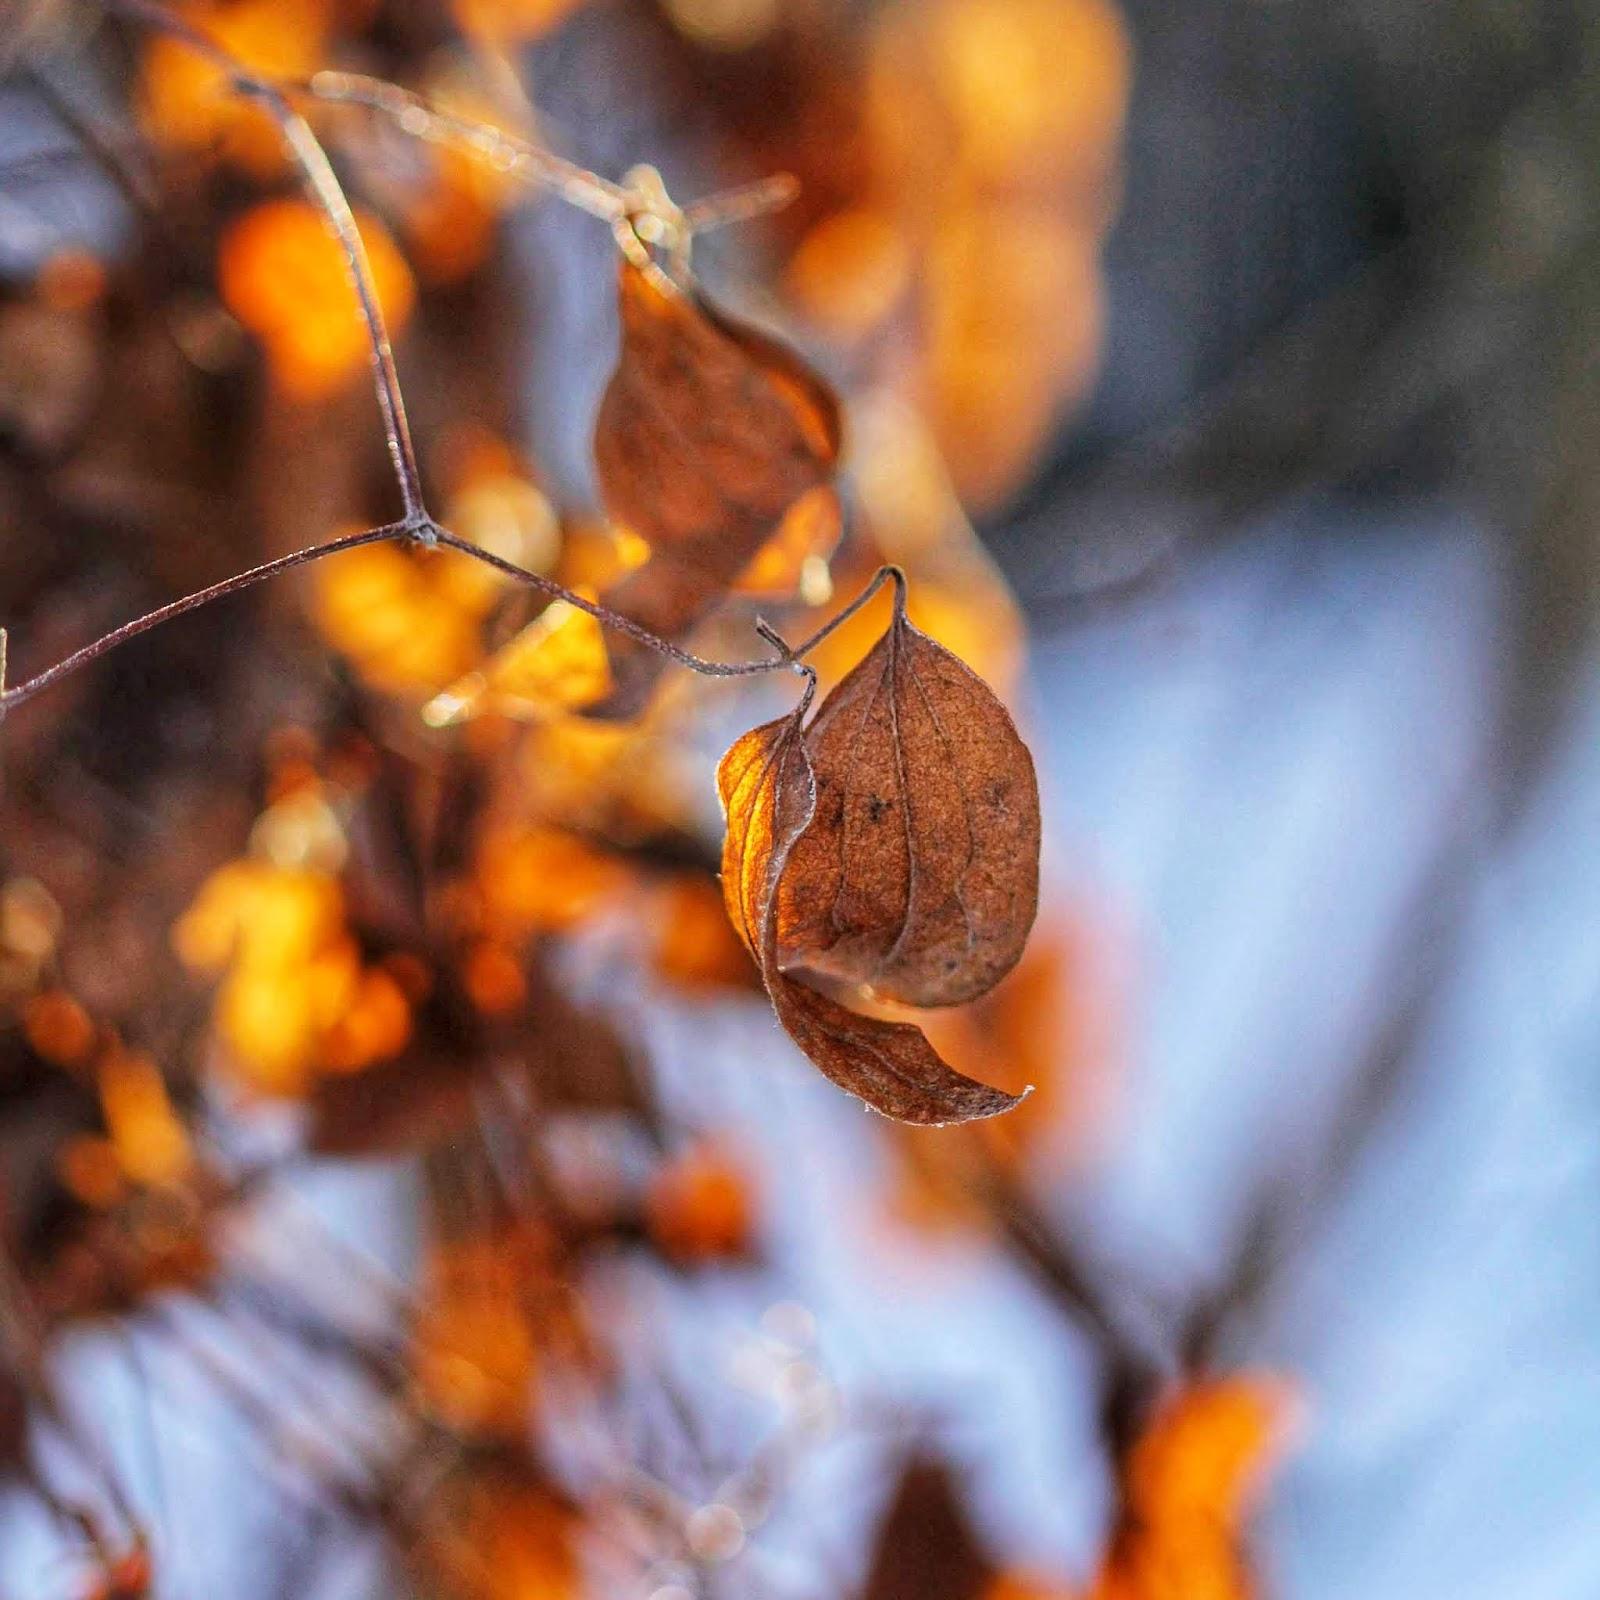 Brown leaves on a dead vine in winter www.ruralmag.com